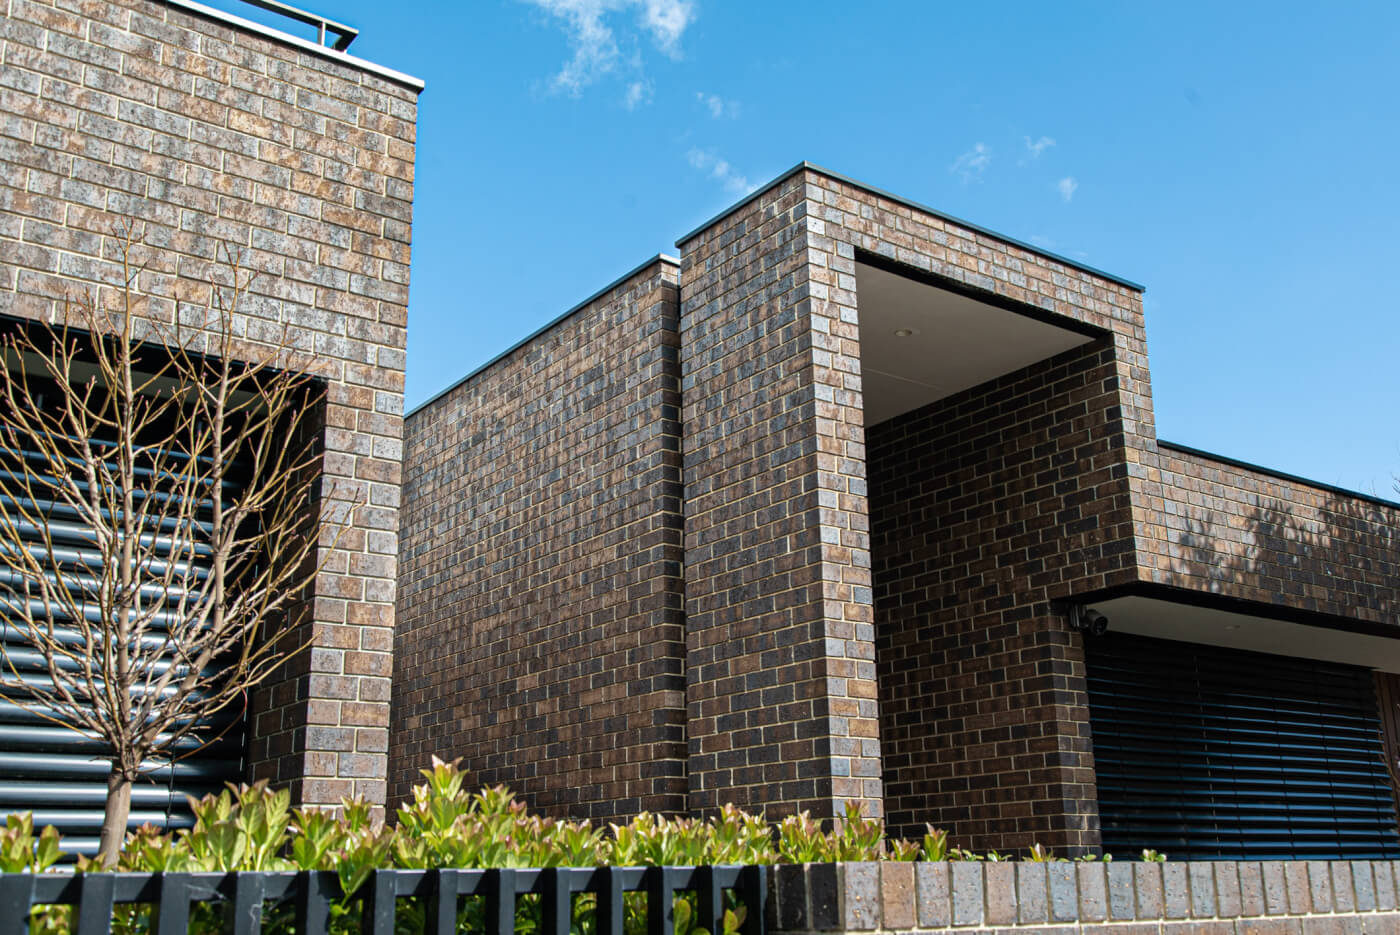 Coachhouse Brick 76mm Hyde Park Littlehampon Bricks And Pavers Reduced 13